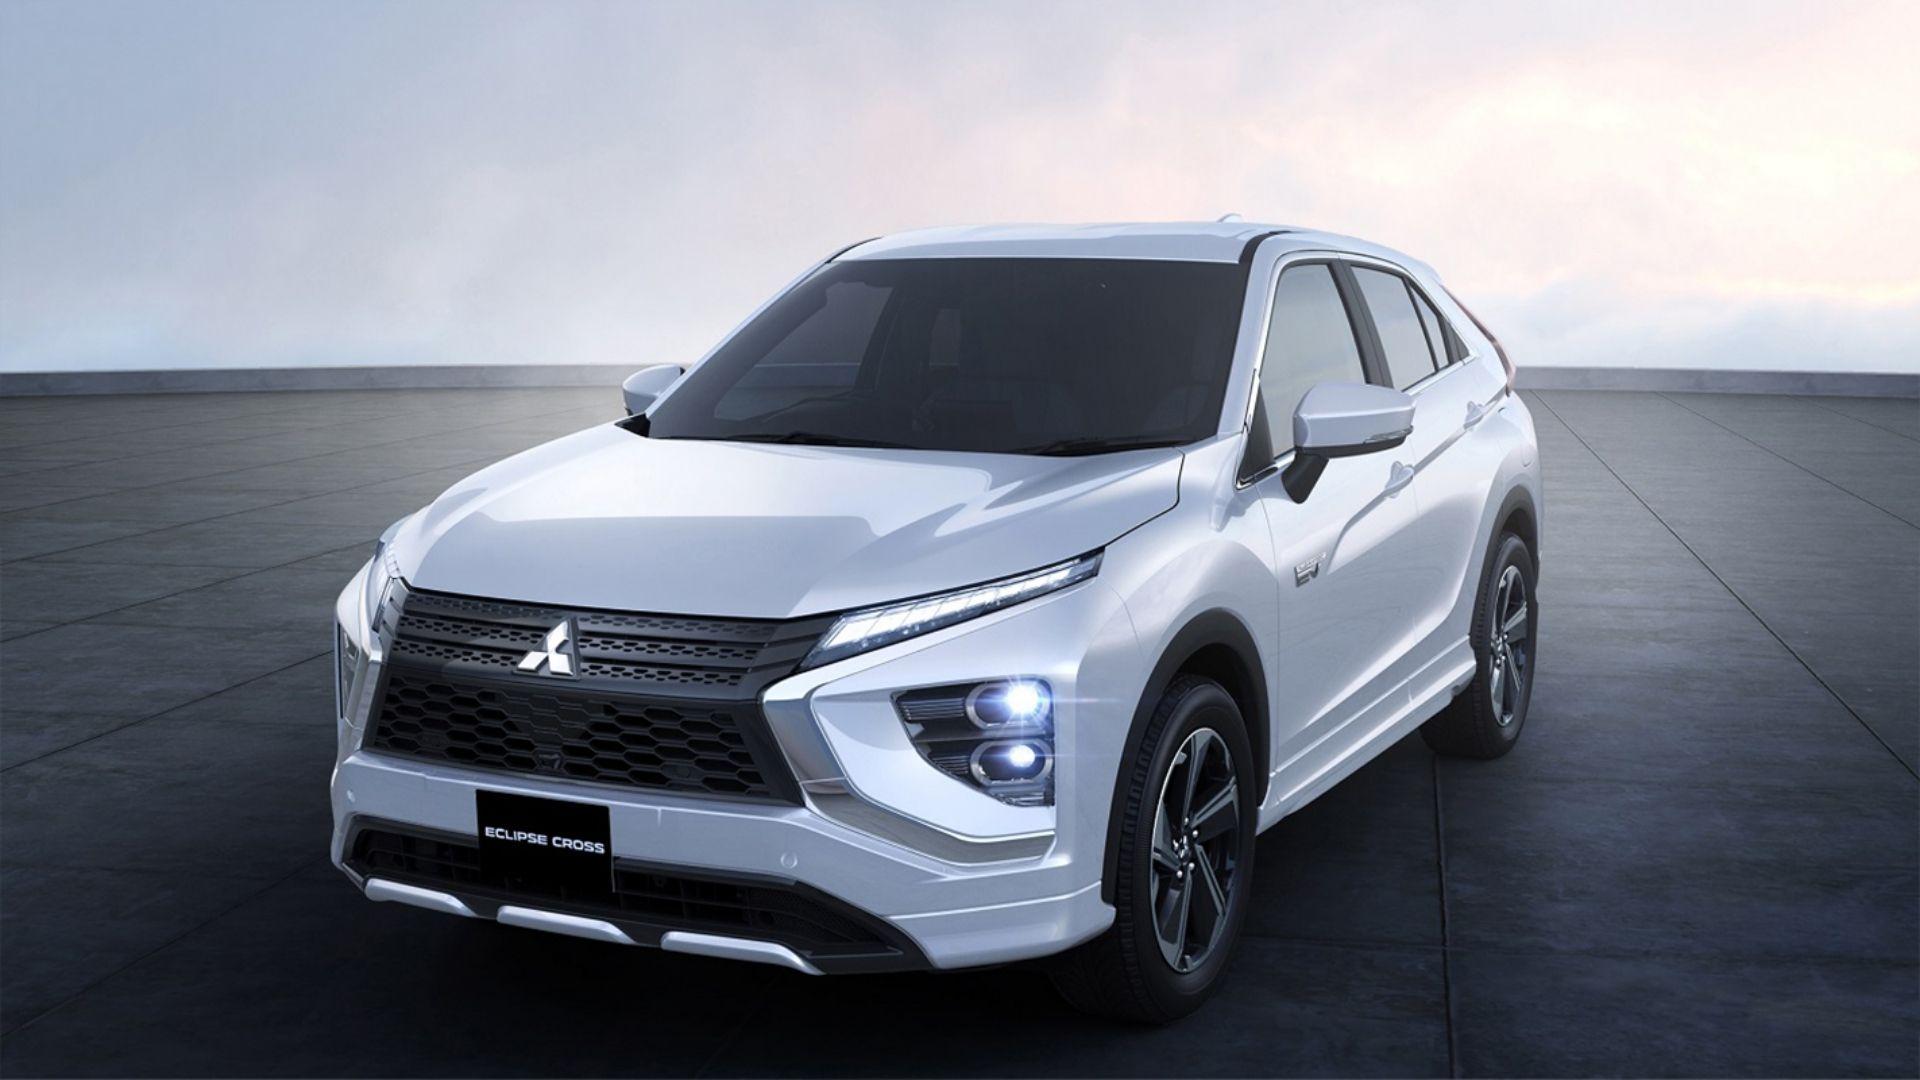 Mitsubishi-Eclipse-Cross-PHEV-white-diamond